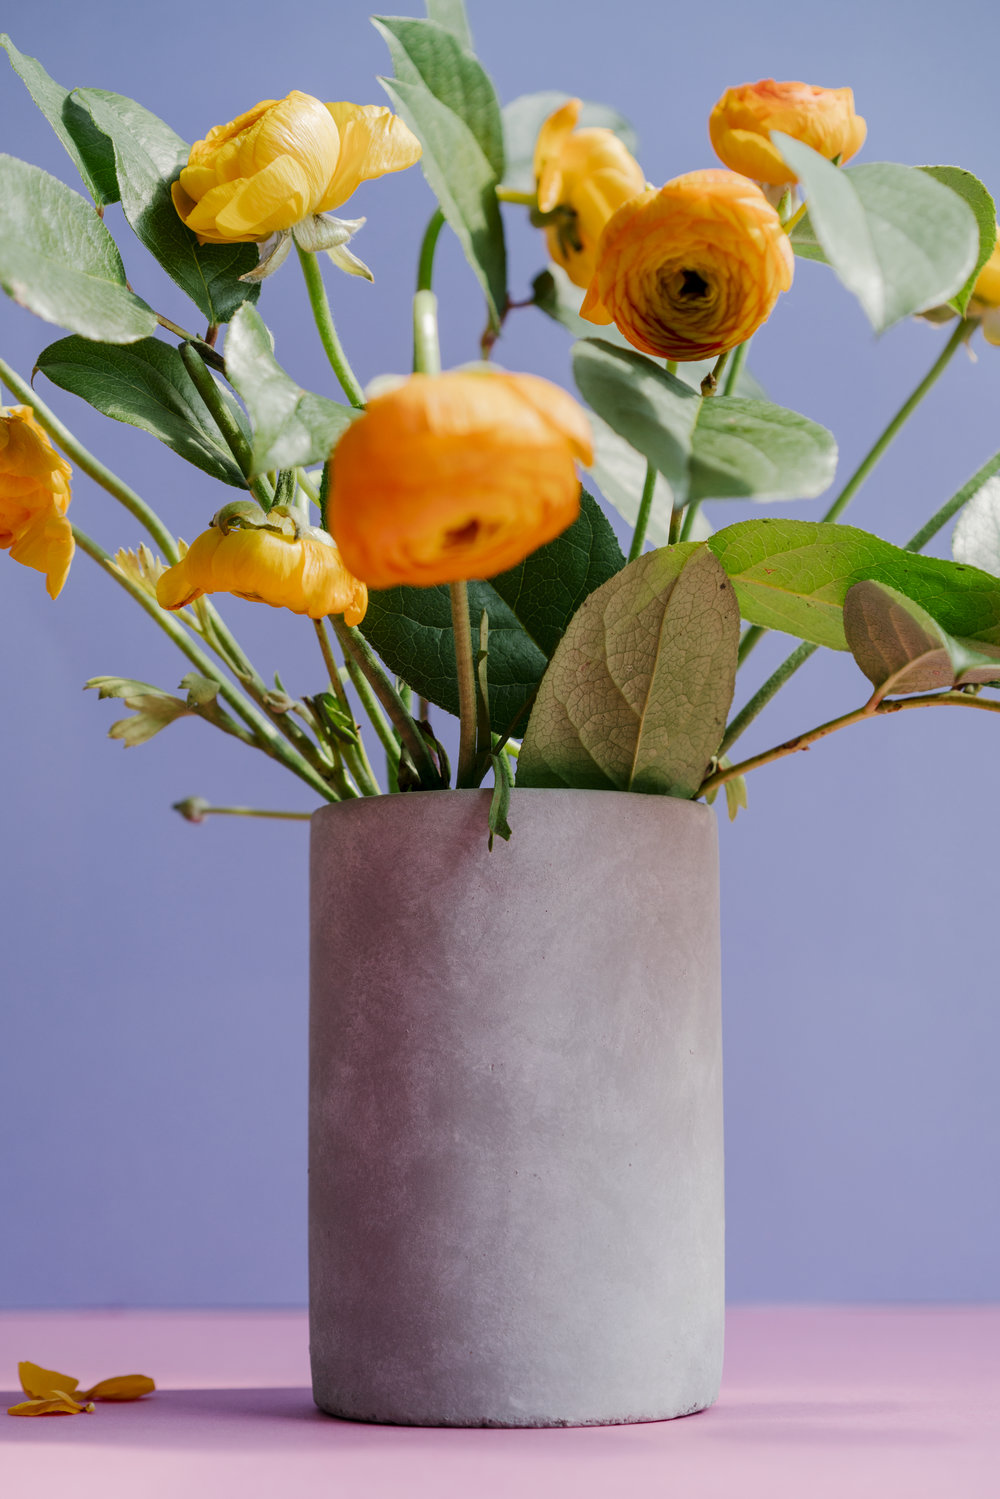 Untitled (Ranunculus)